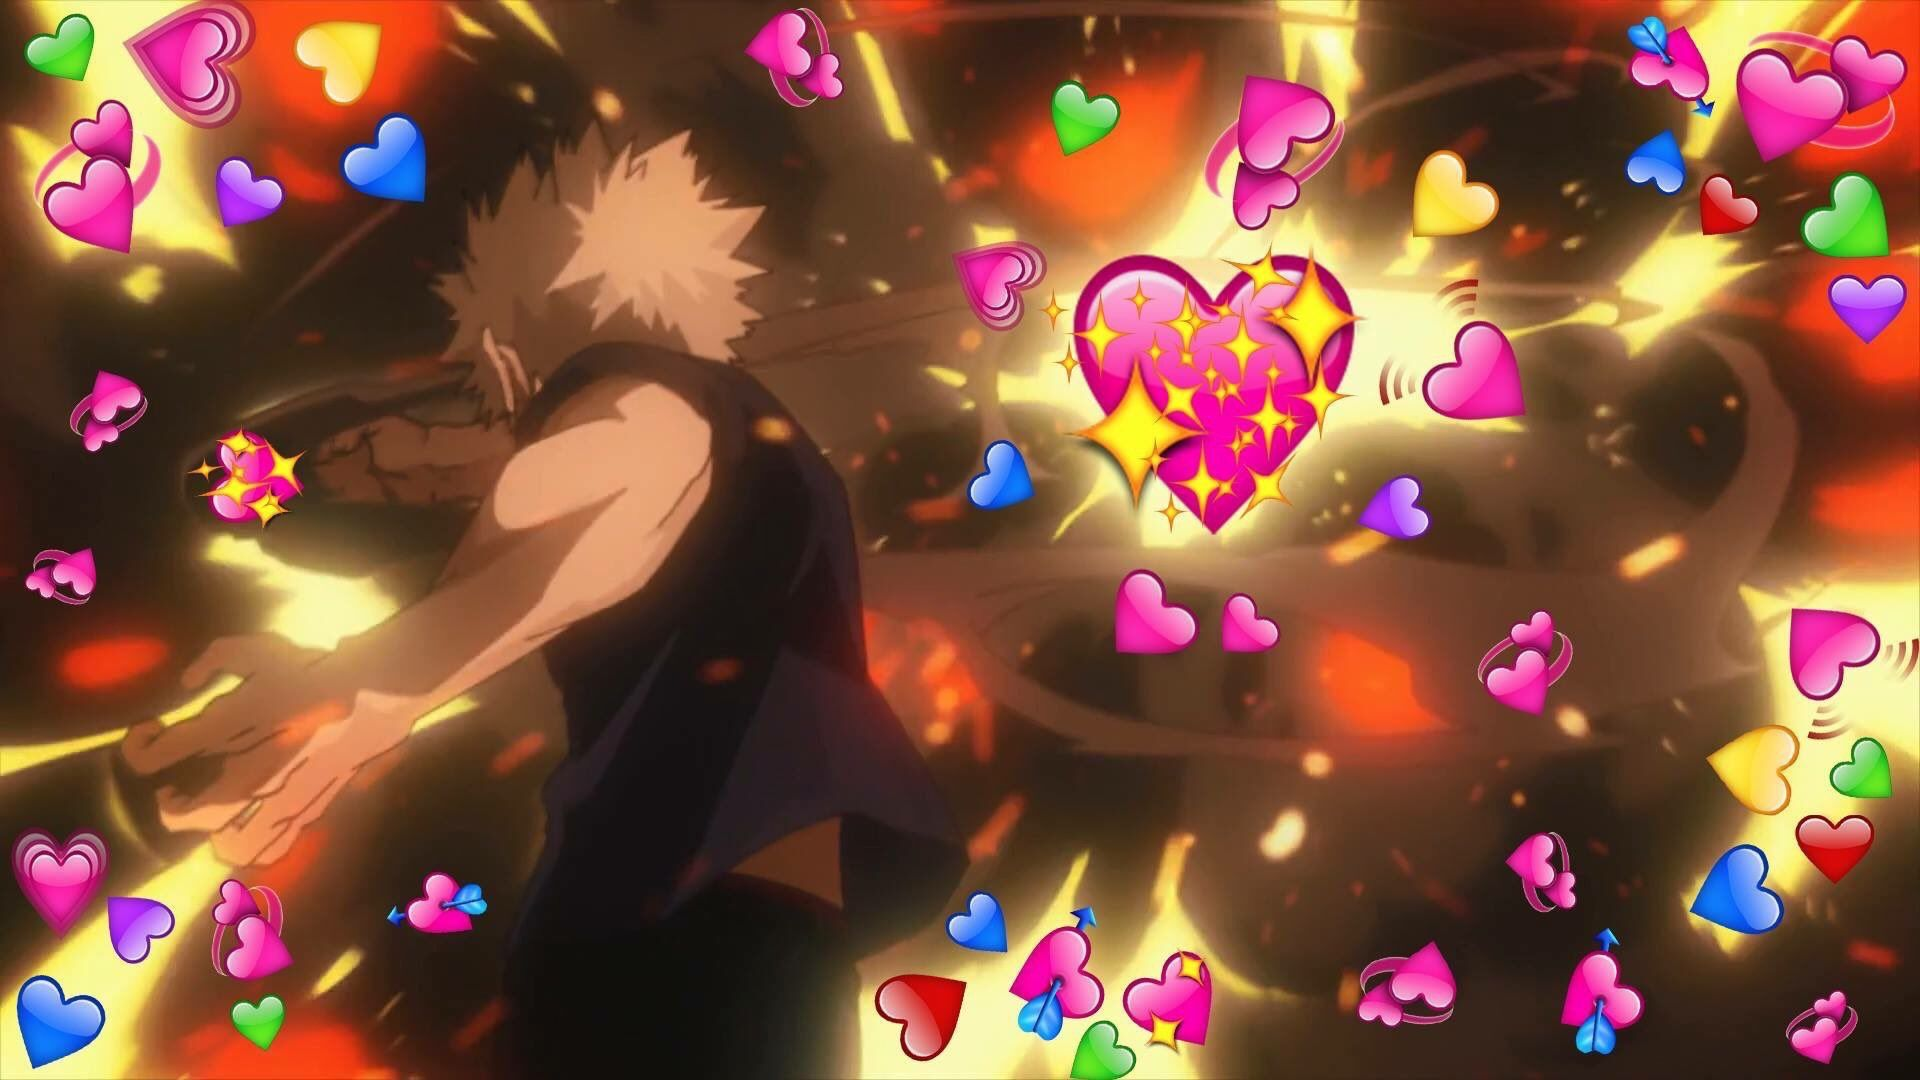 Image By Alexandra Keller On Bnha Memes Cute Love Memes Anime